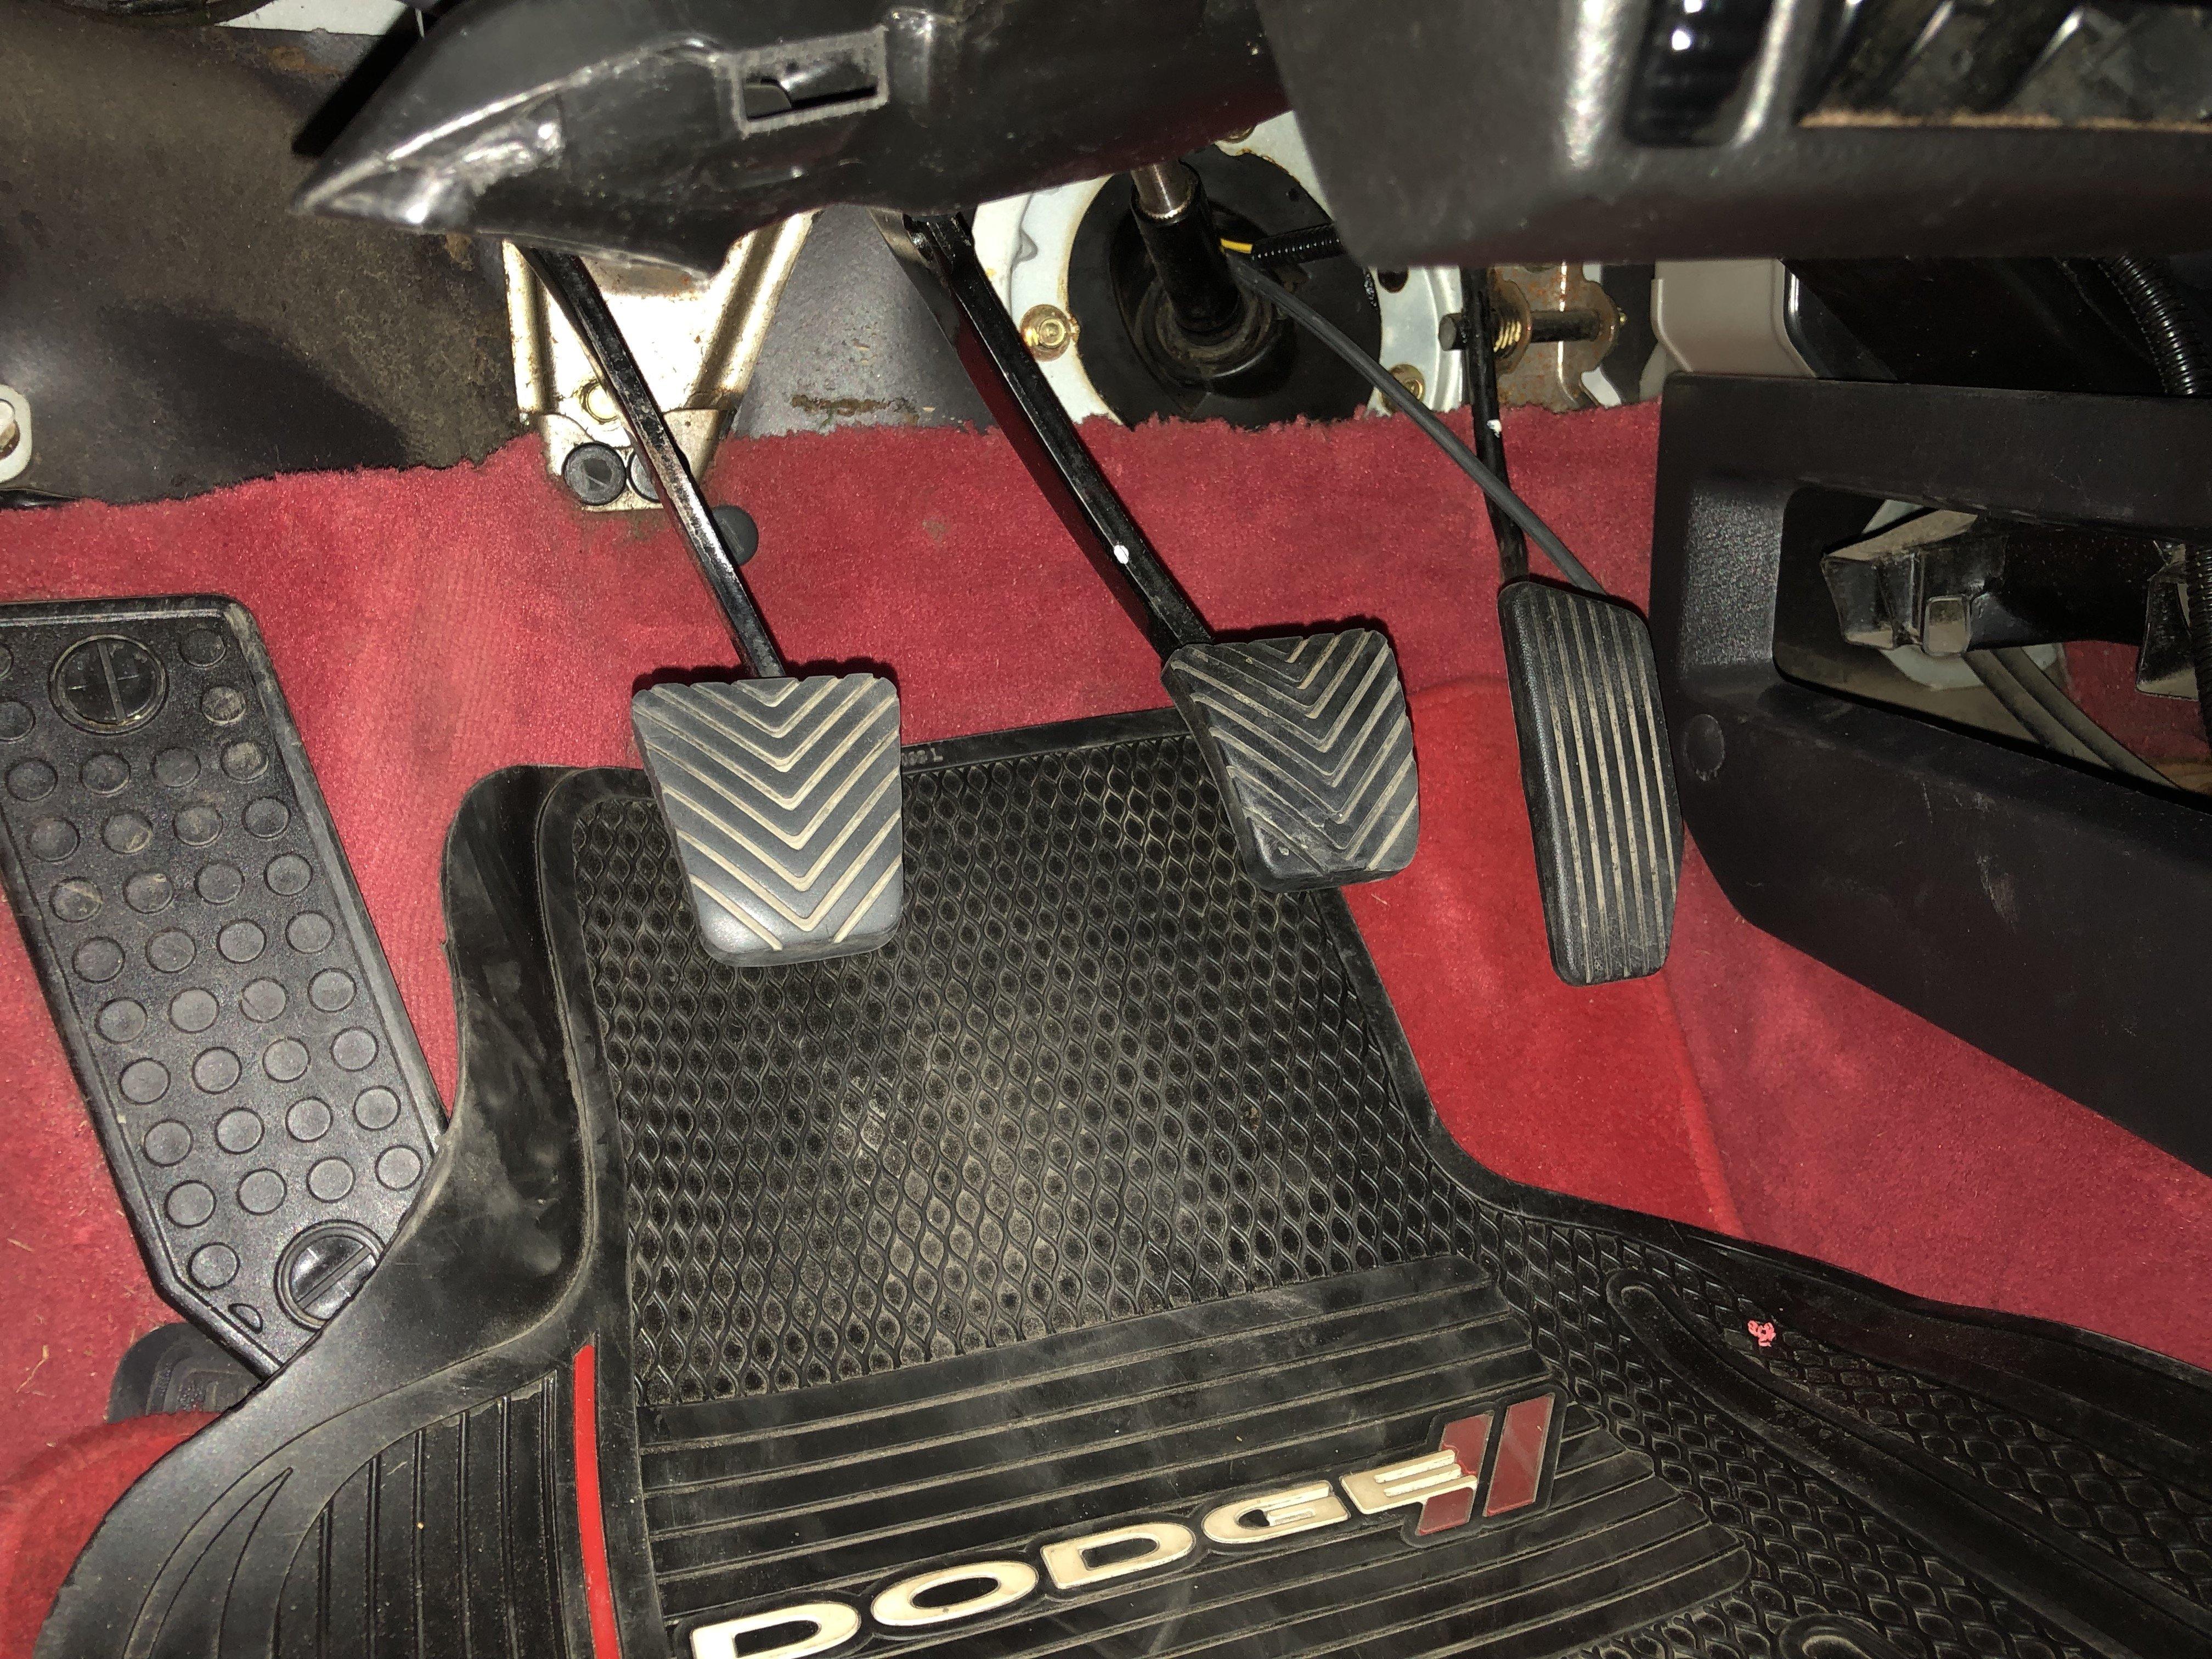 VMS pedal covers good for 5hp?-ixlpwmgdsoqviuxachqvta.jpg